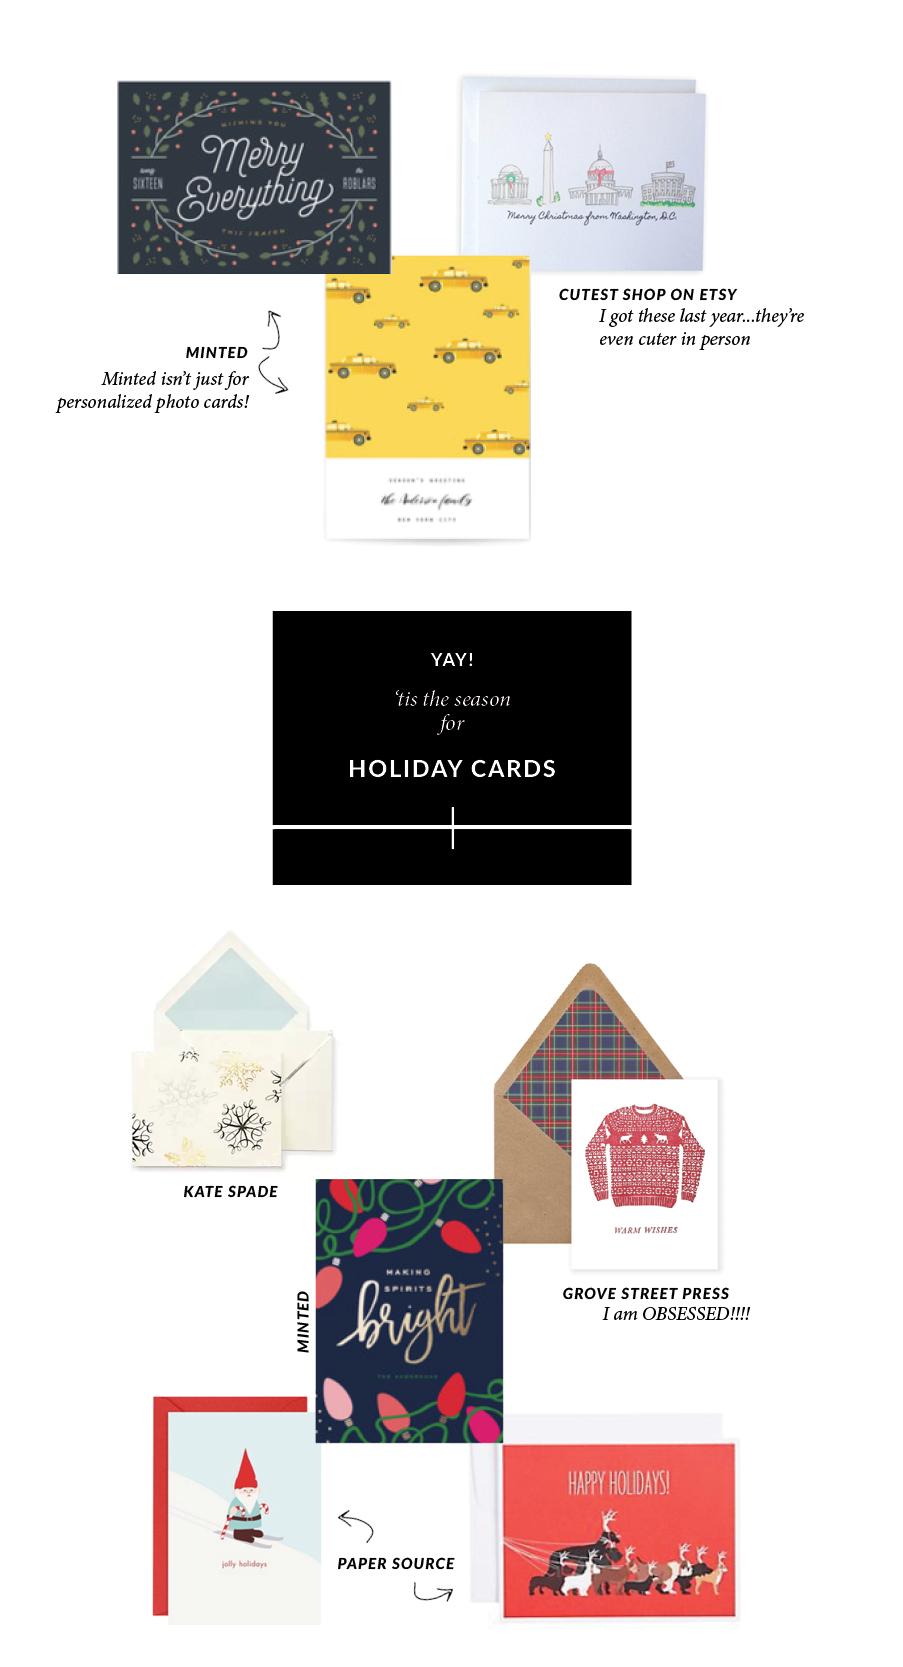 Where to buy holiday cards | Monica Dutia